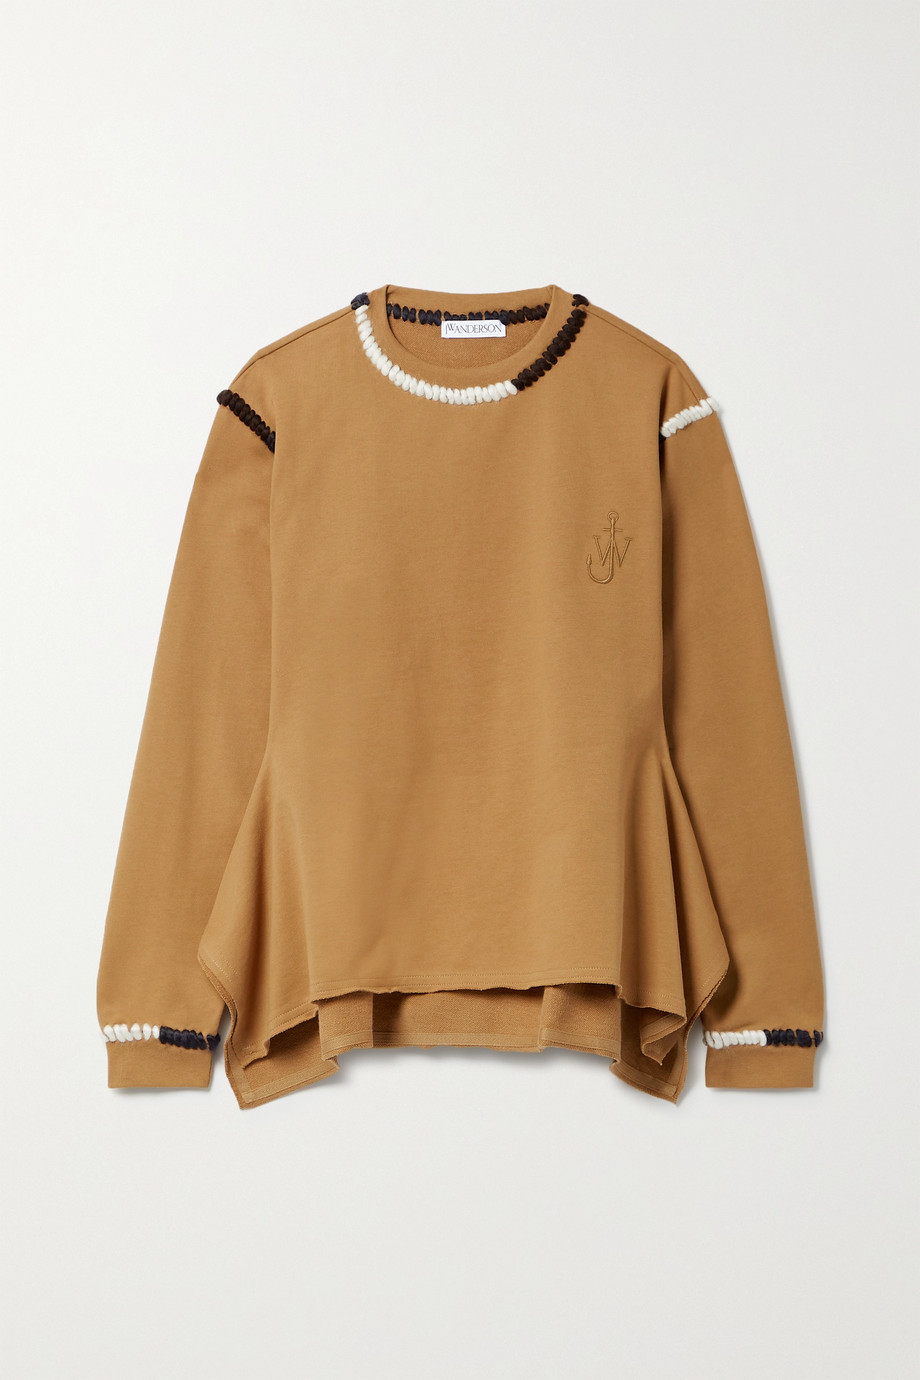 JW Anderson Asymmetric embroidered cotton-jersey sweatshirt